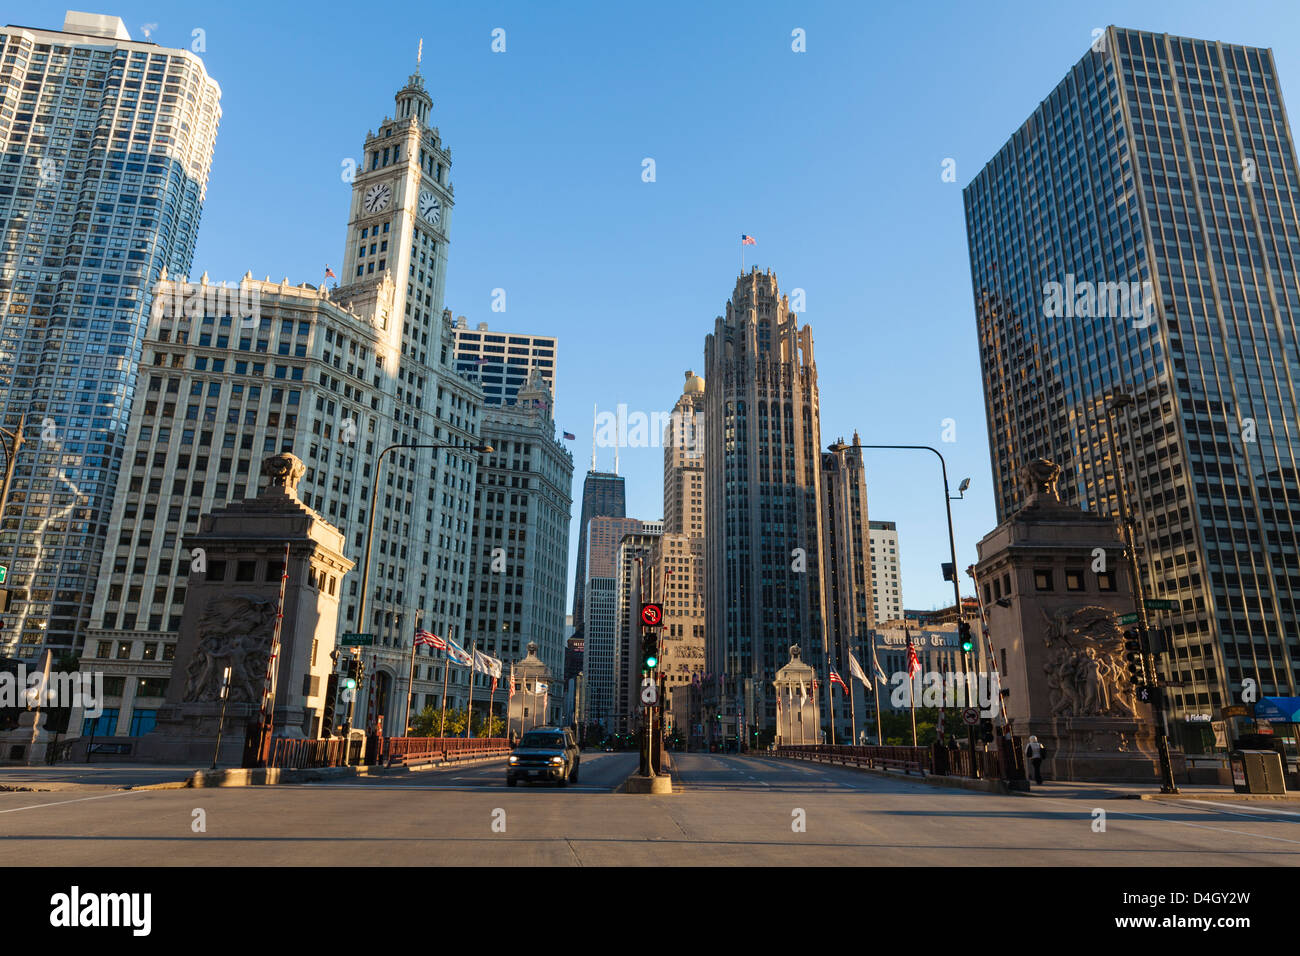 DuSable Bridge looking up North Michigan Avenue, Chicago, Illinois, USA - Stock Image